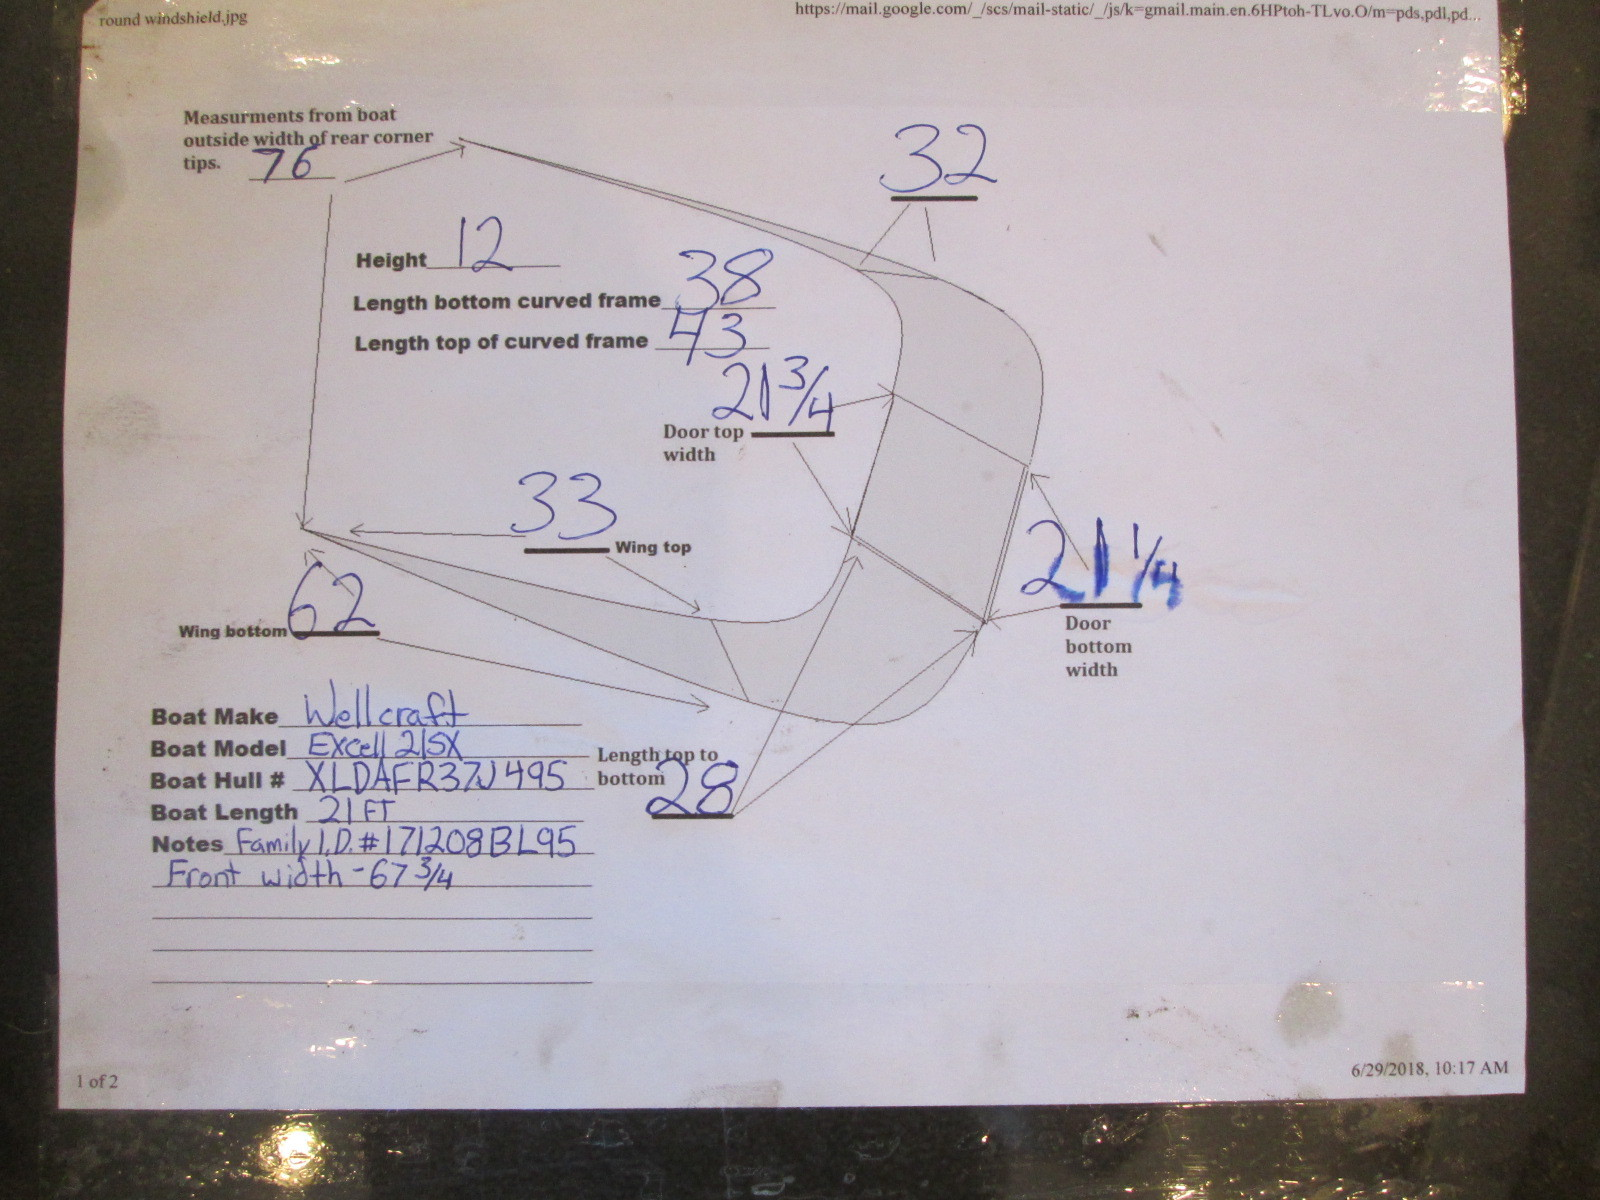 1995 Wellcraft Excel 21SX Boat Windshield Window Gl ... on sailboat electrical diagram, wellcraft electrical wiring, wellcraft electrical schematic, wellcraft parts catalog,